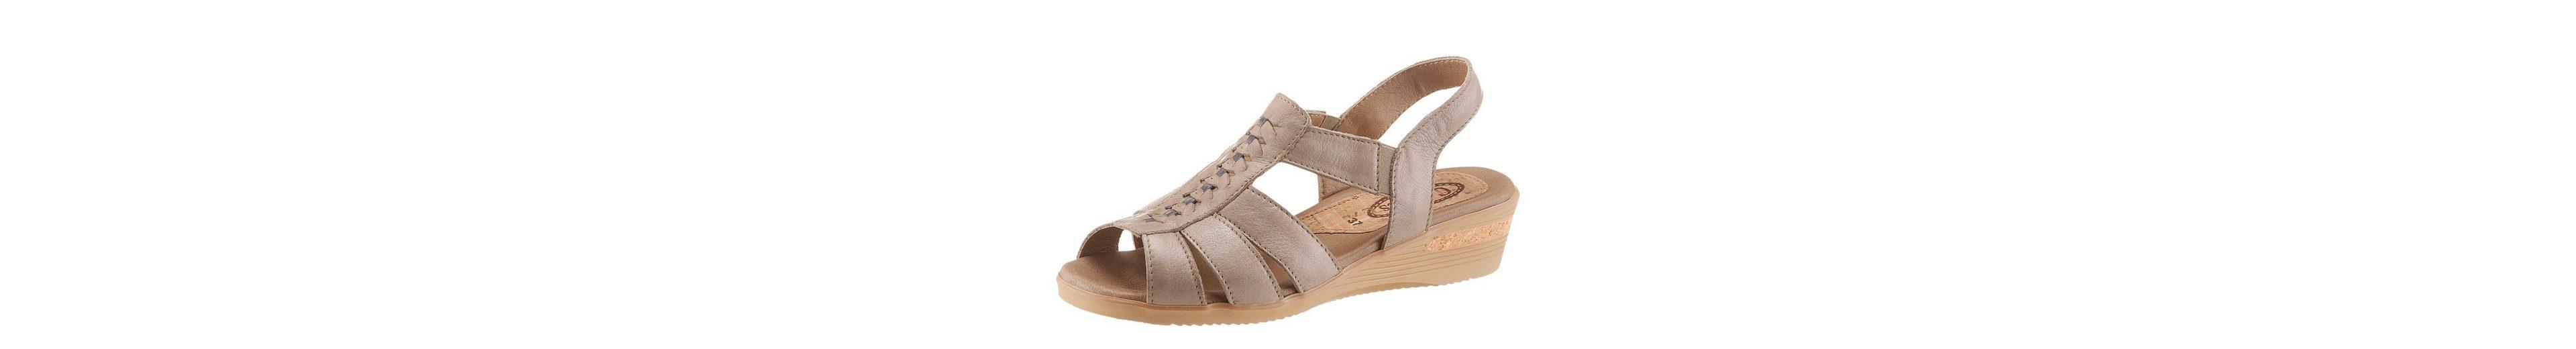 Corkies Sandalette mit rutschhemmender PU-Laufsohle Bequem Online OfTe75mhx